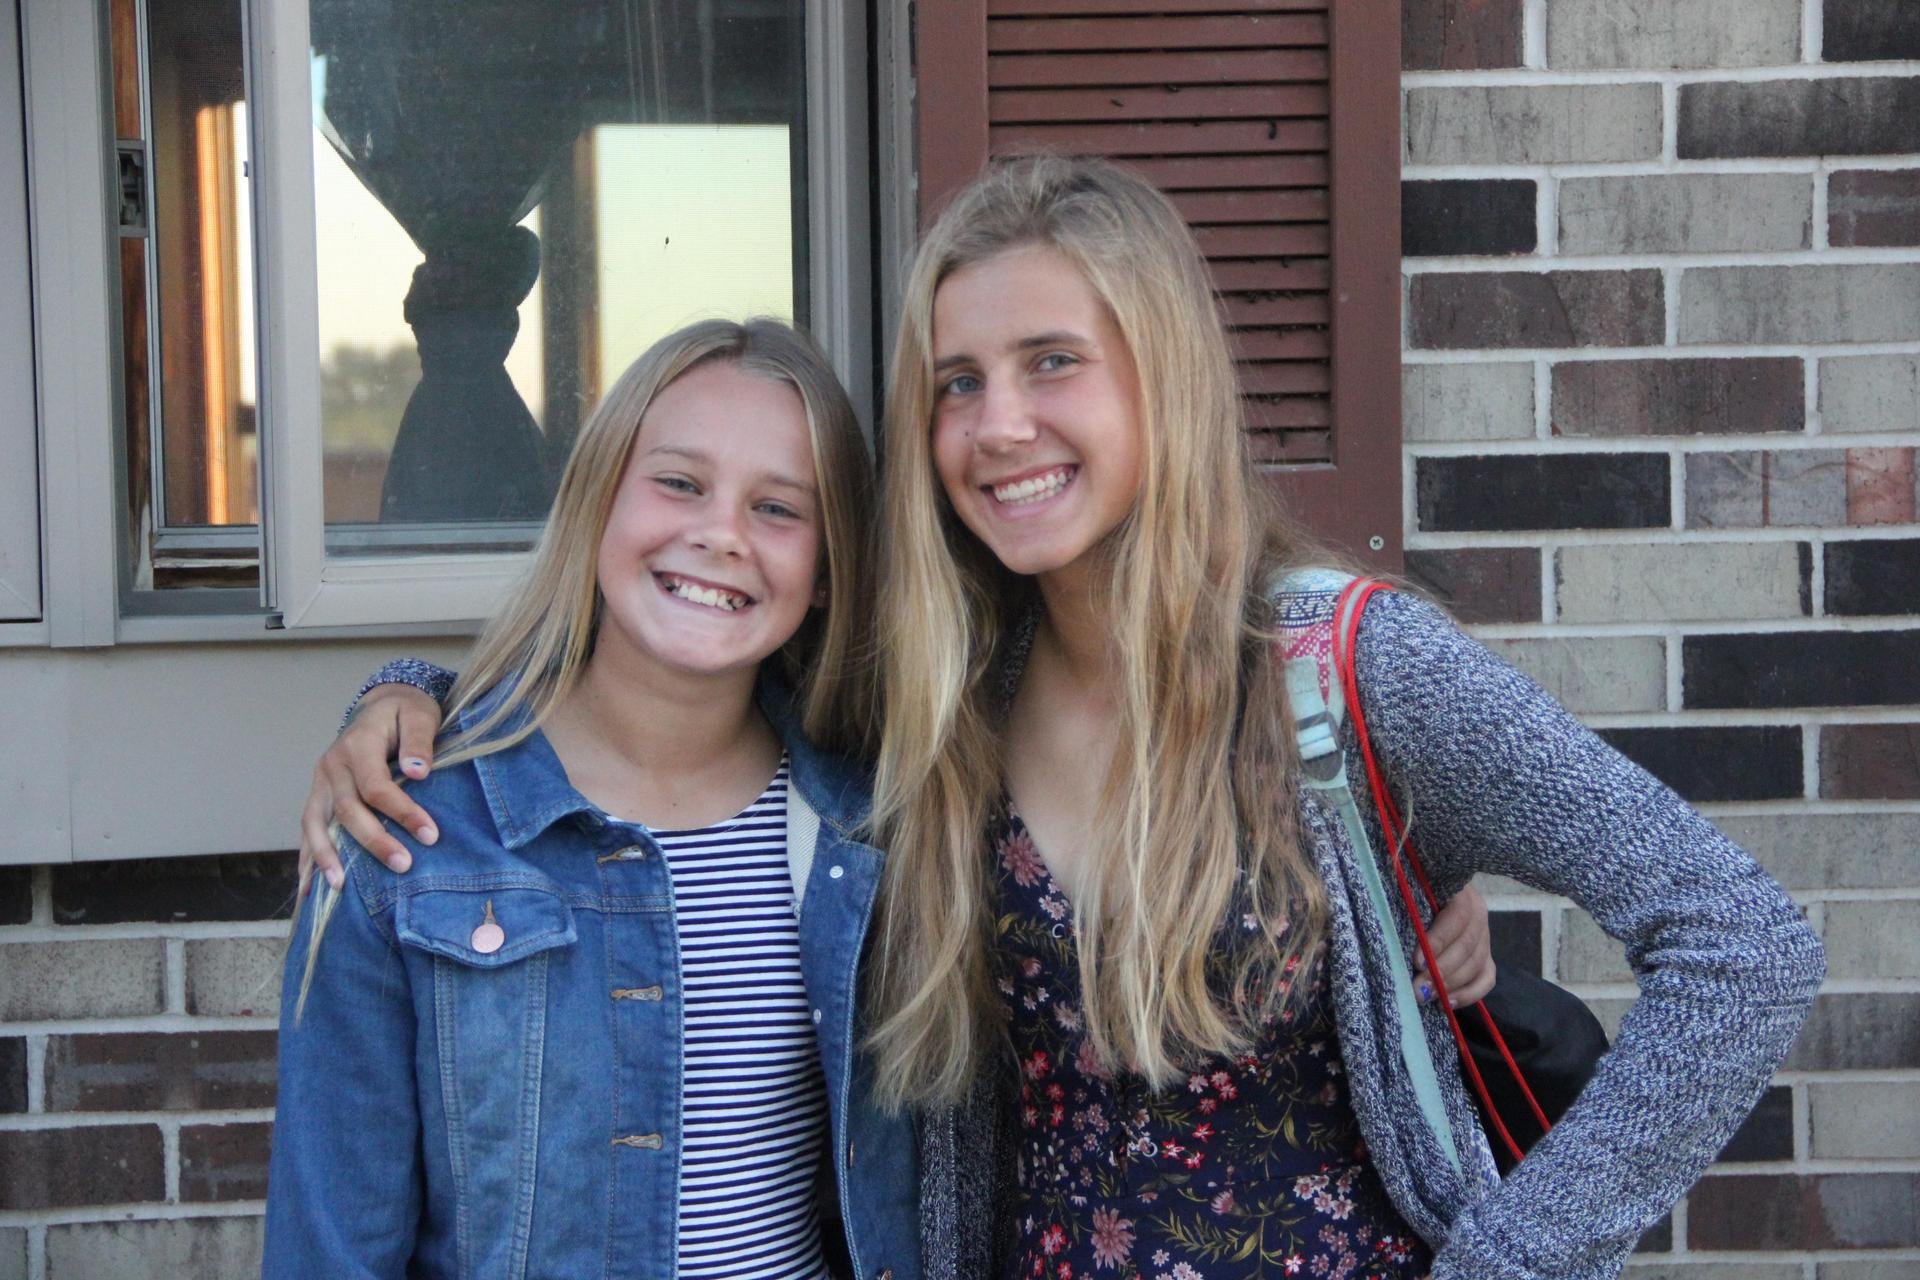 Riley and Megan